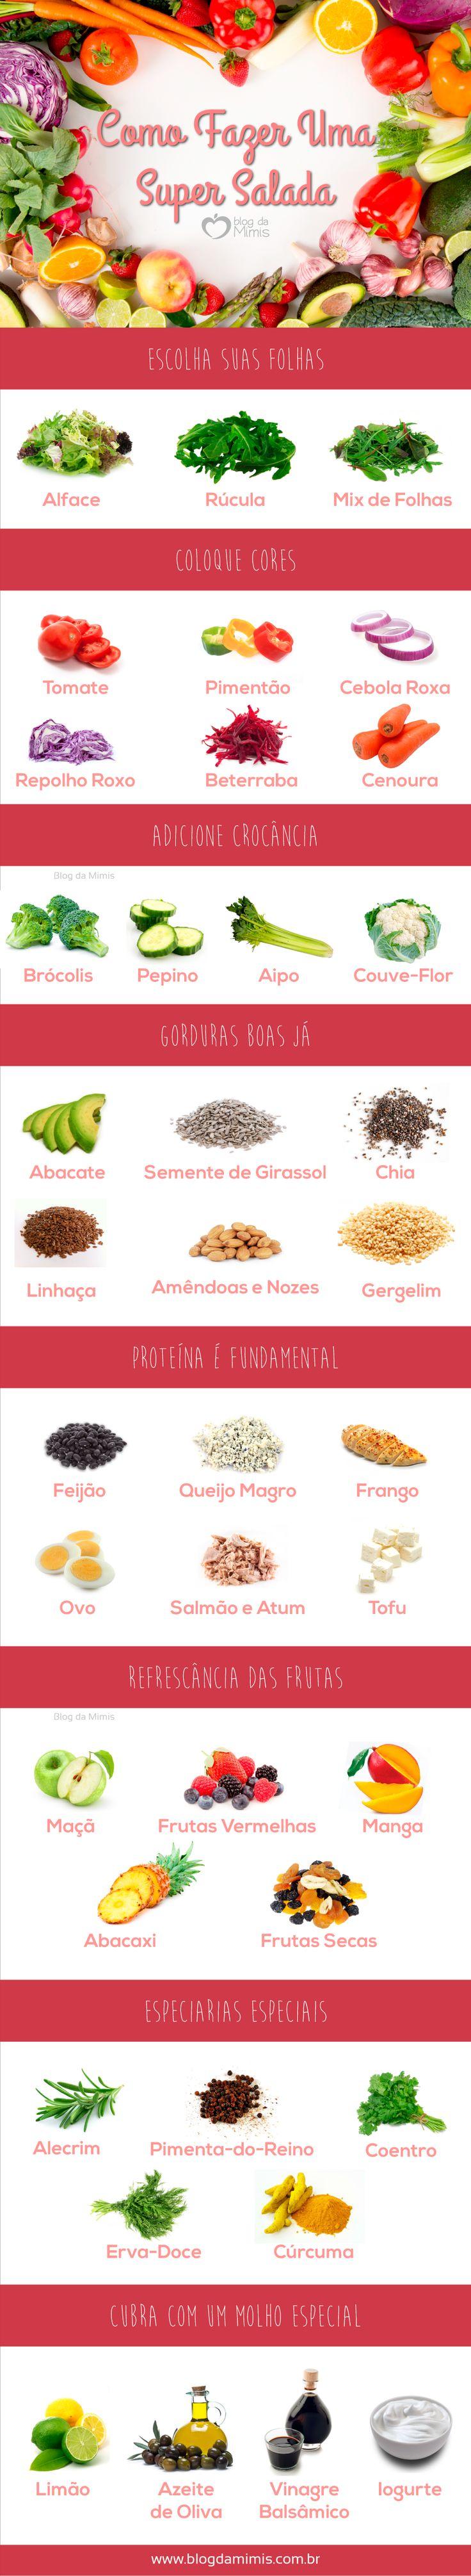 como-fazer-uma-super-salada-blog-da-mimis-michelle-franzoni-post